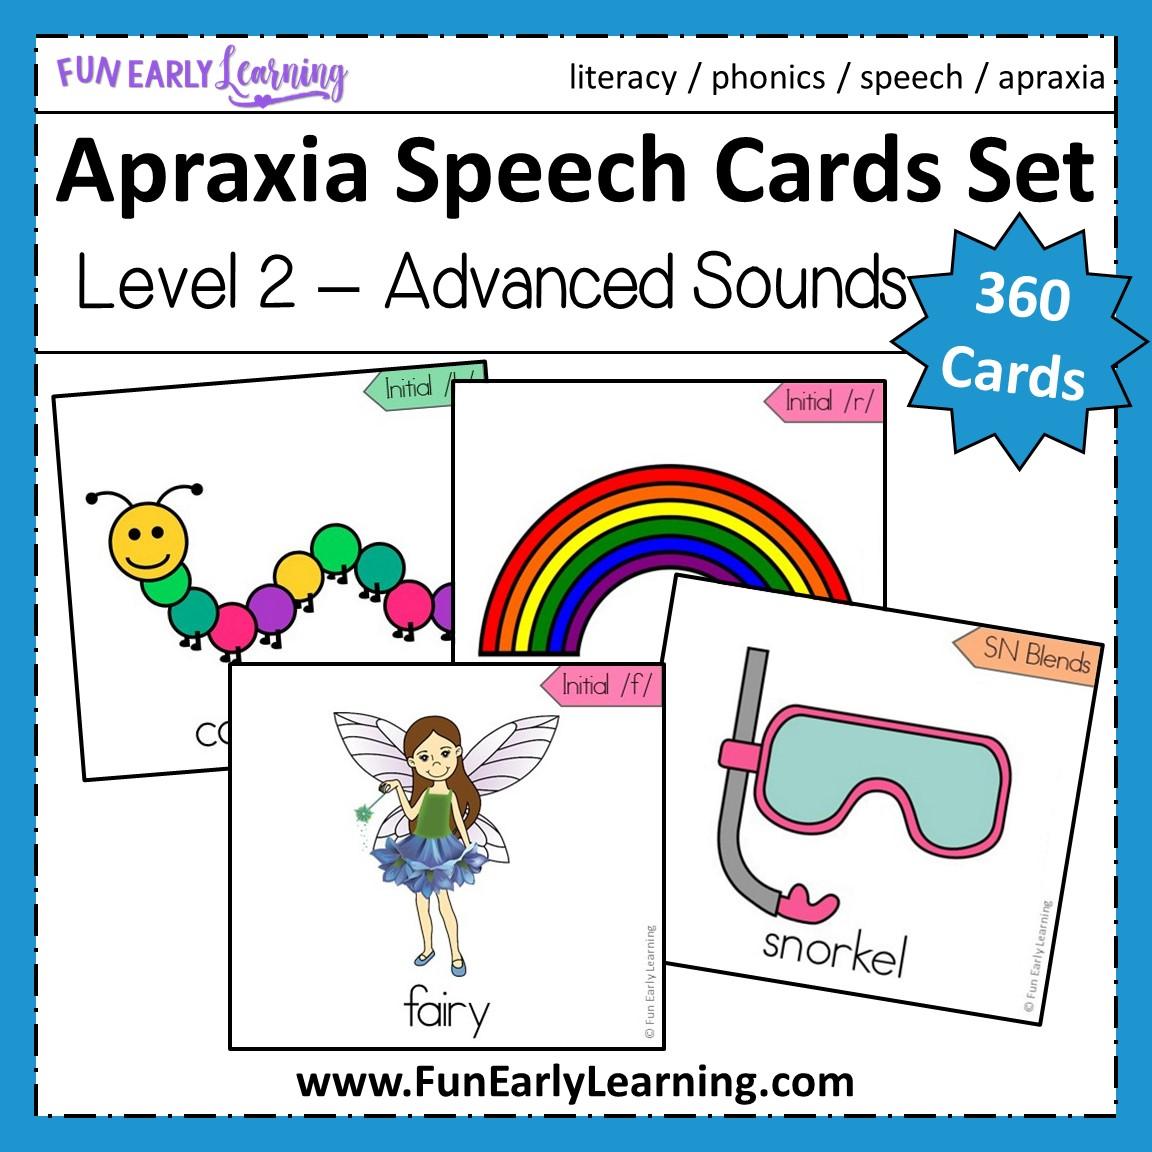 Apraxia Speech Cards Set Level 2